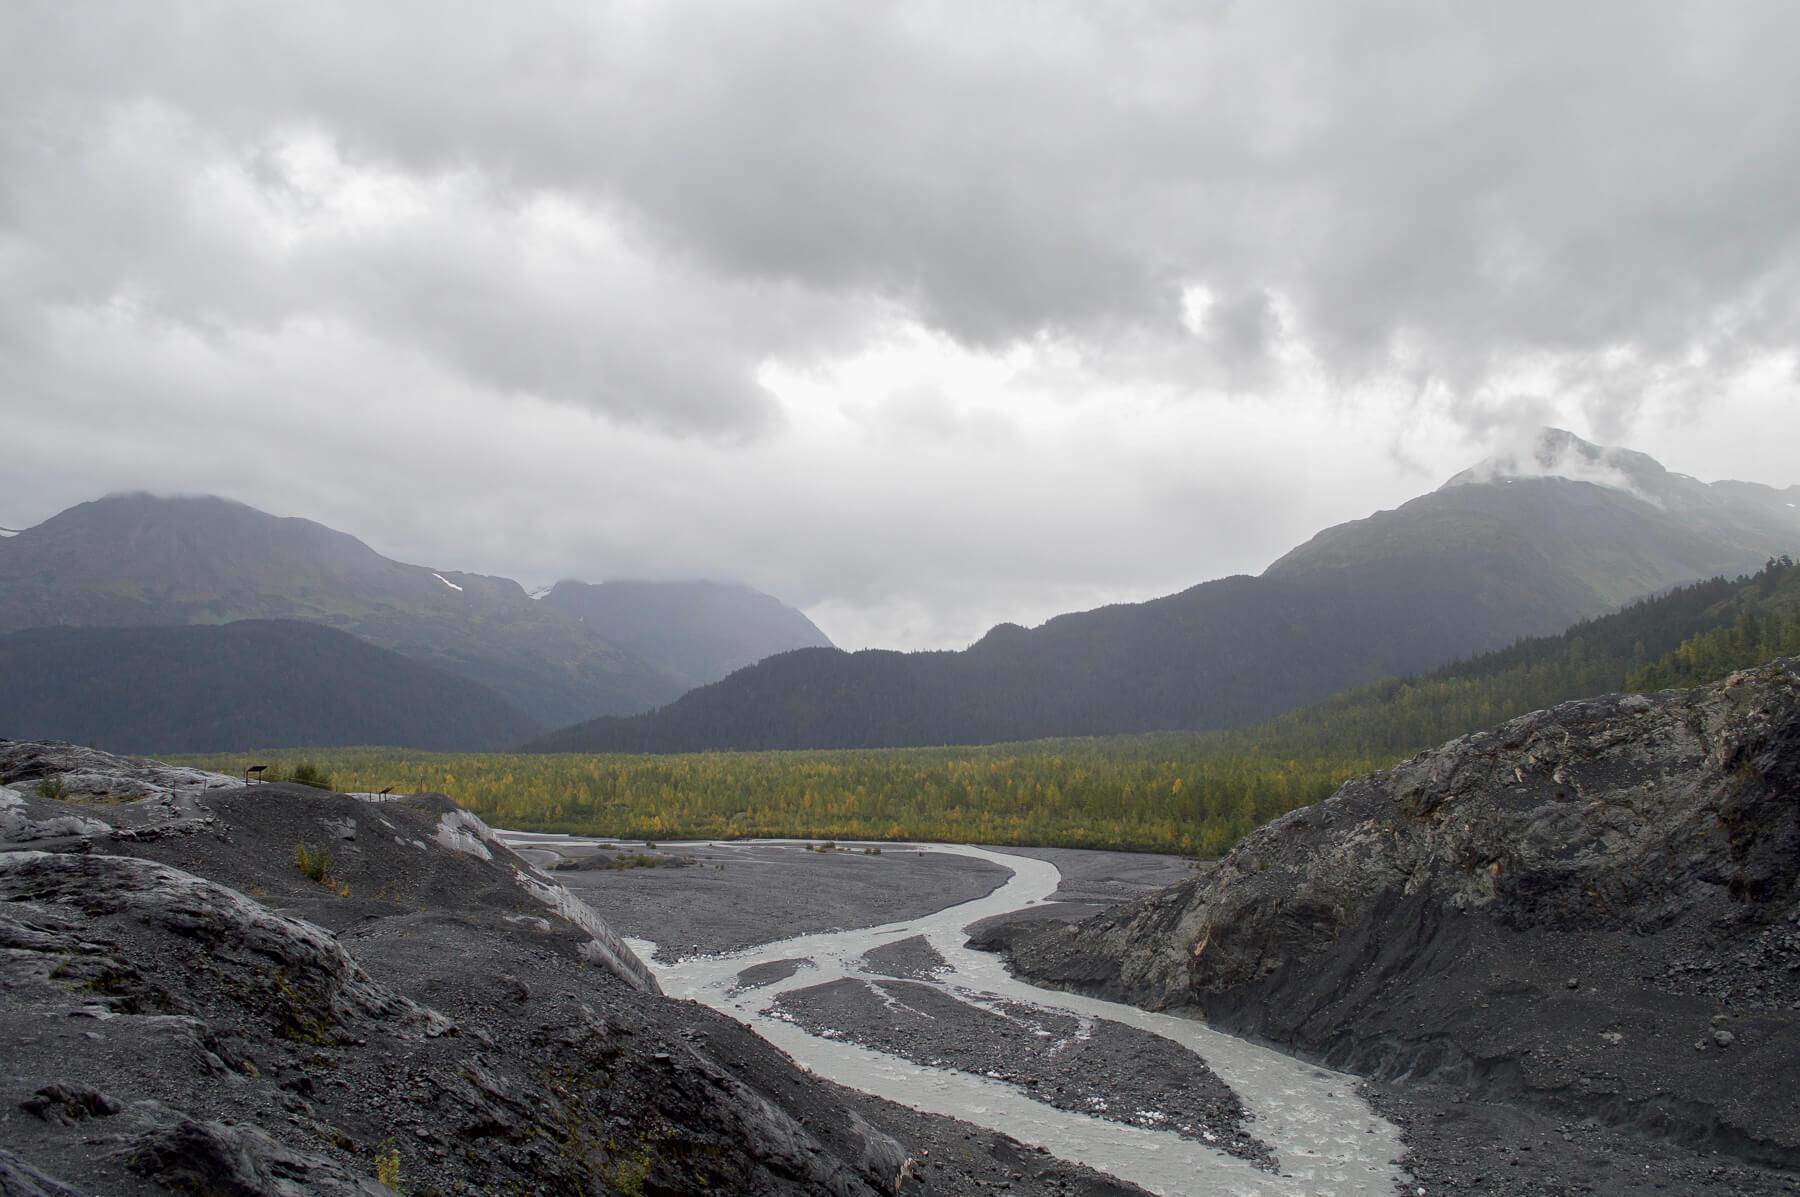 glacier run off in kenai fjords national park